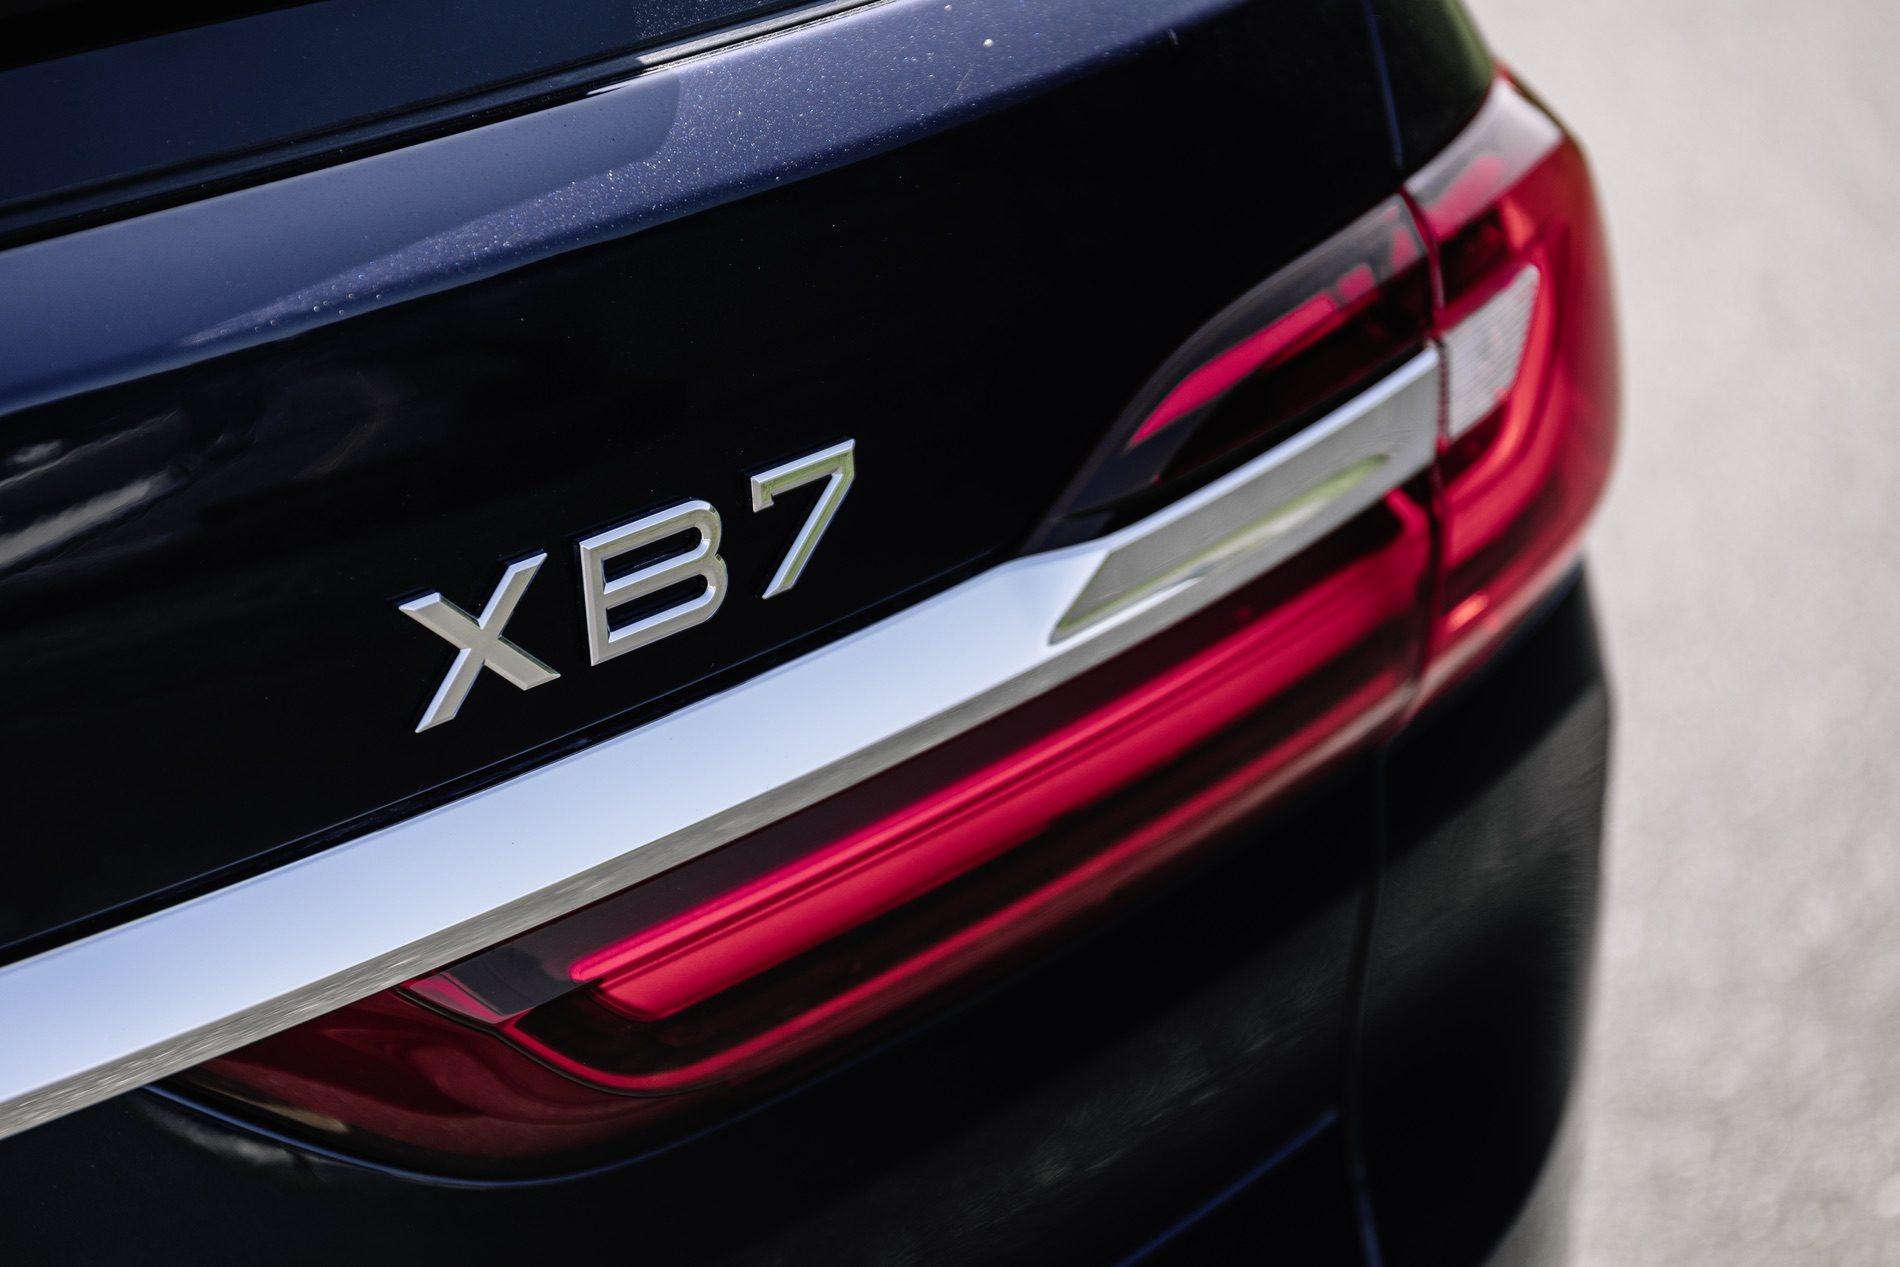 Phien ban BMW X7 hieu nang cao anh 19